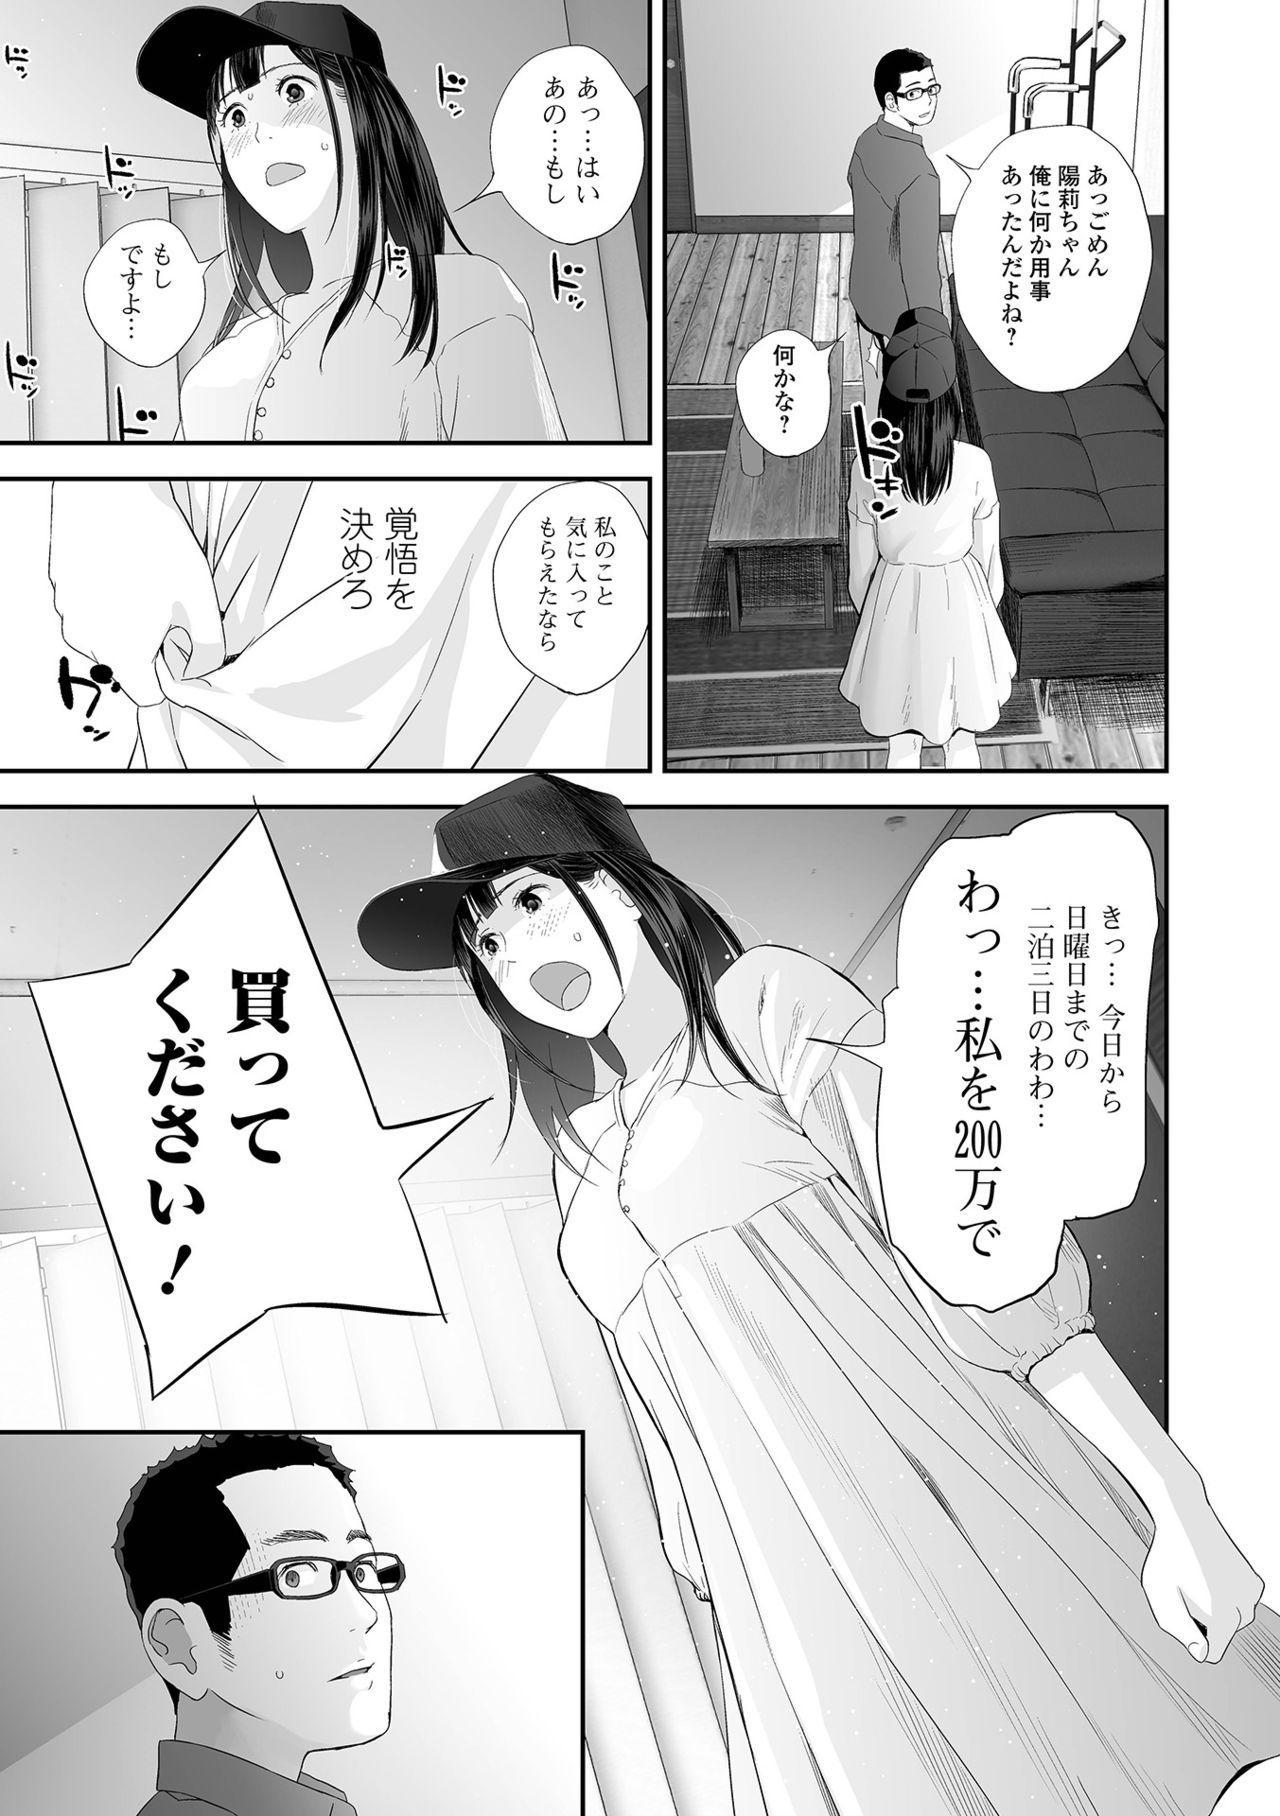 COMIC Shigekiteki SQUIRT!! Vol. 25 50